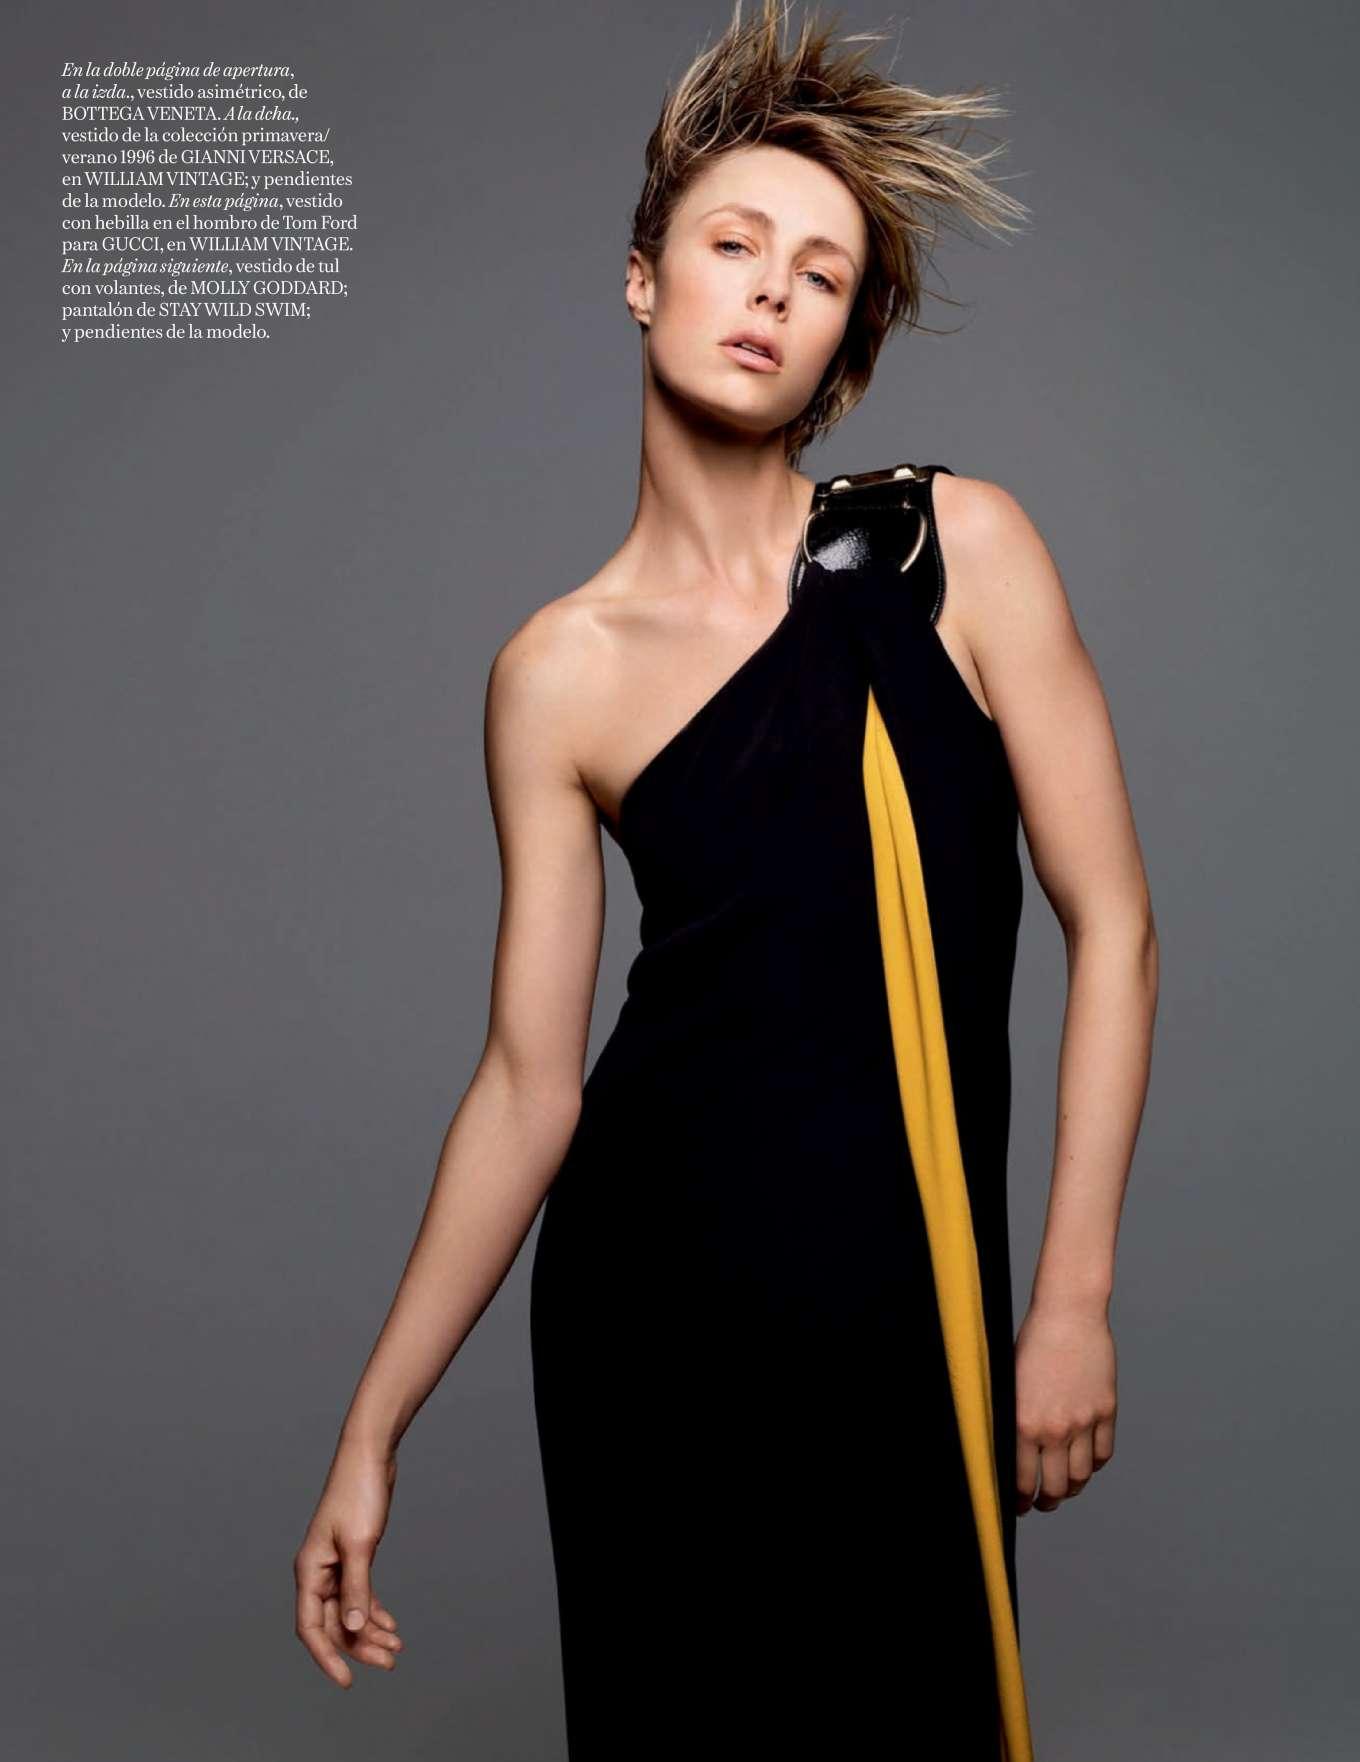 Edie Campbell 2019 : Edie Campbell – Vogue Espana 2020-01